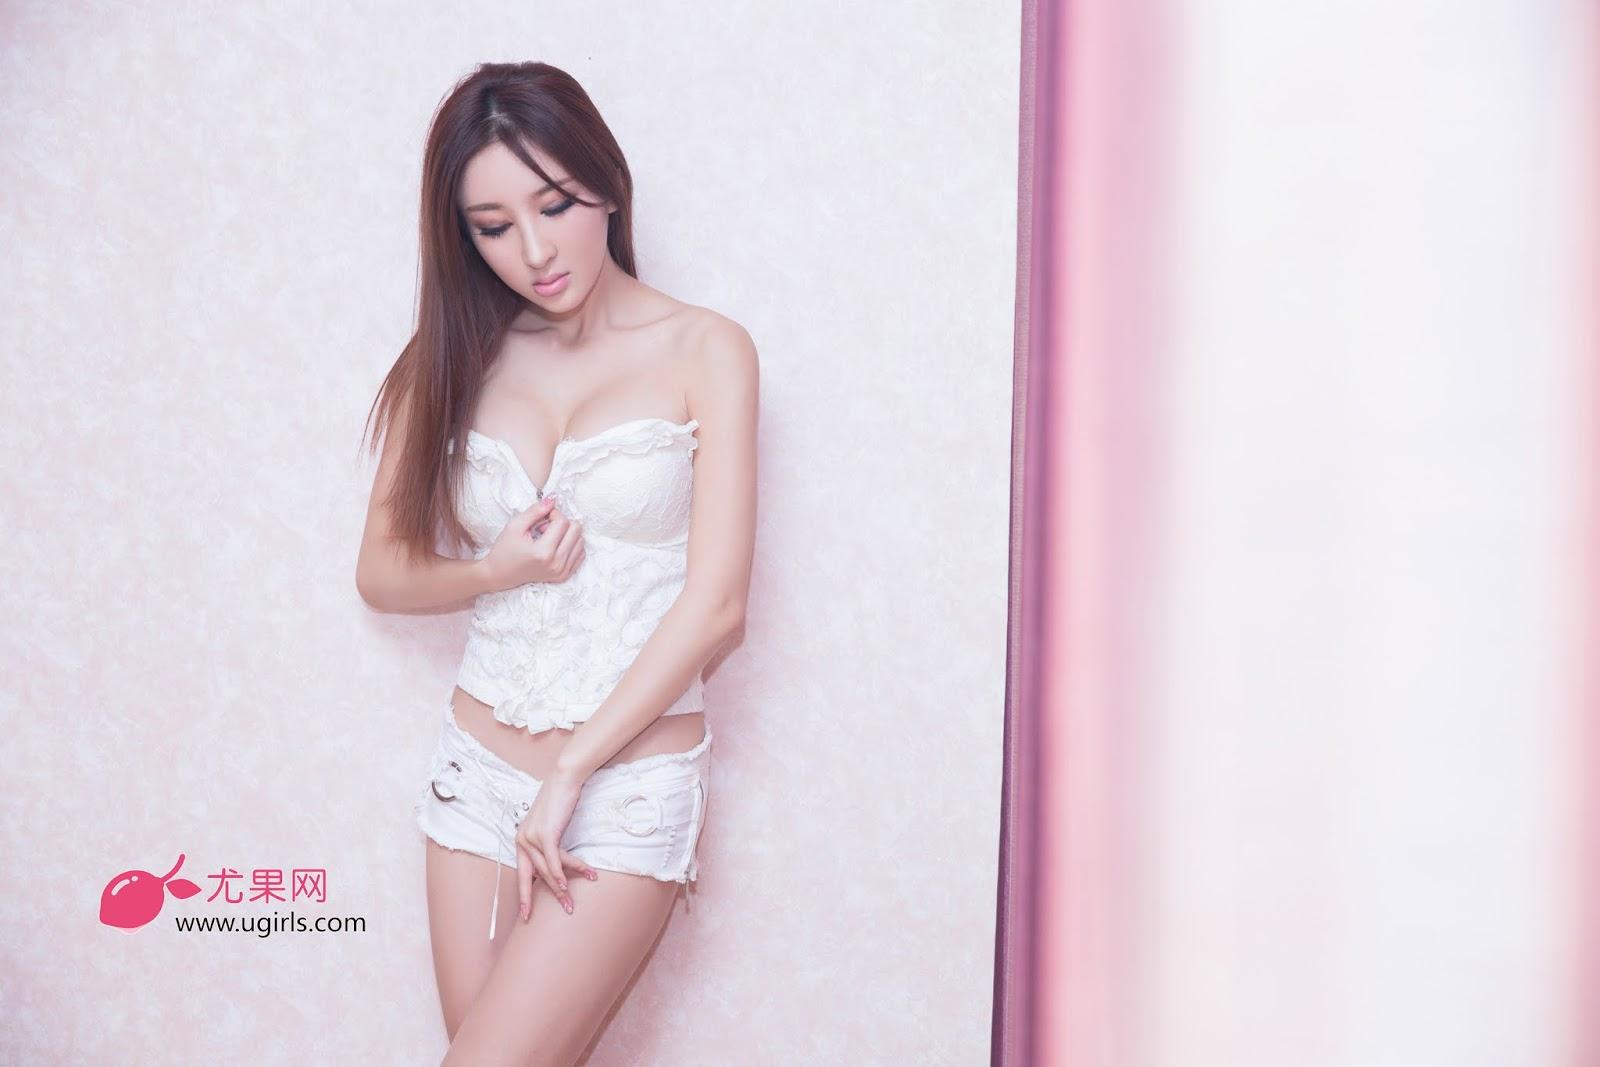 A14A6489 - Hot Photo UGIRLS NO.6 Nude Girl